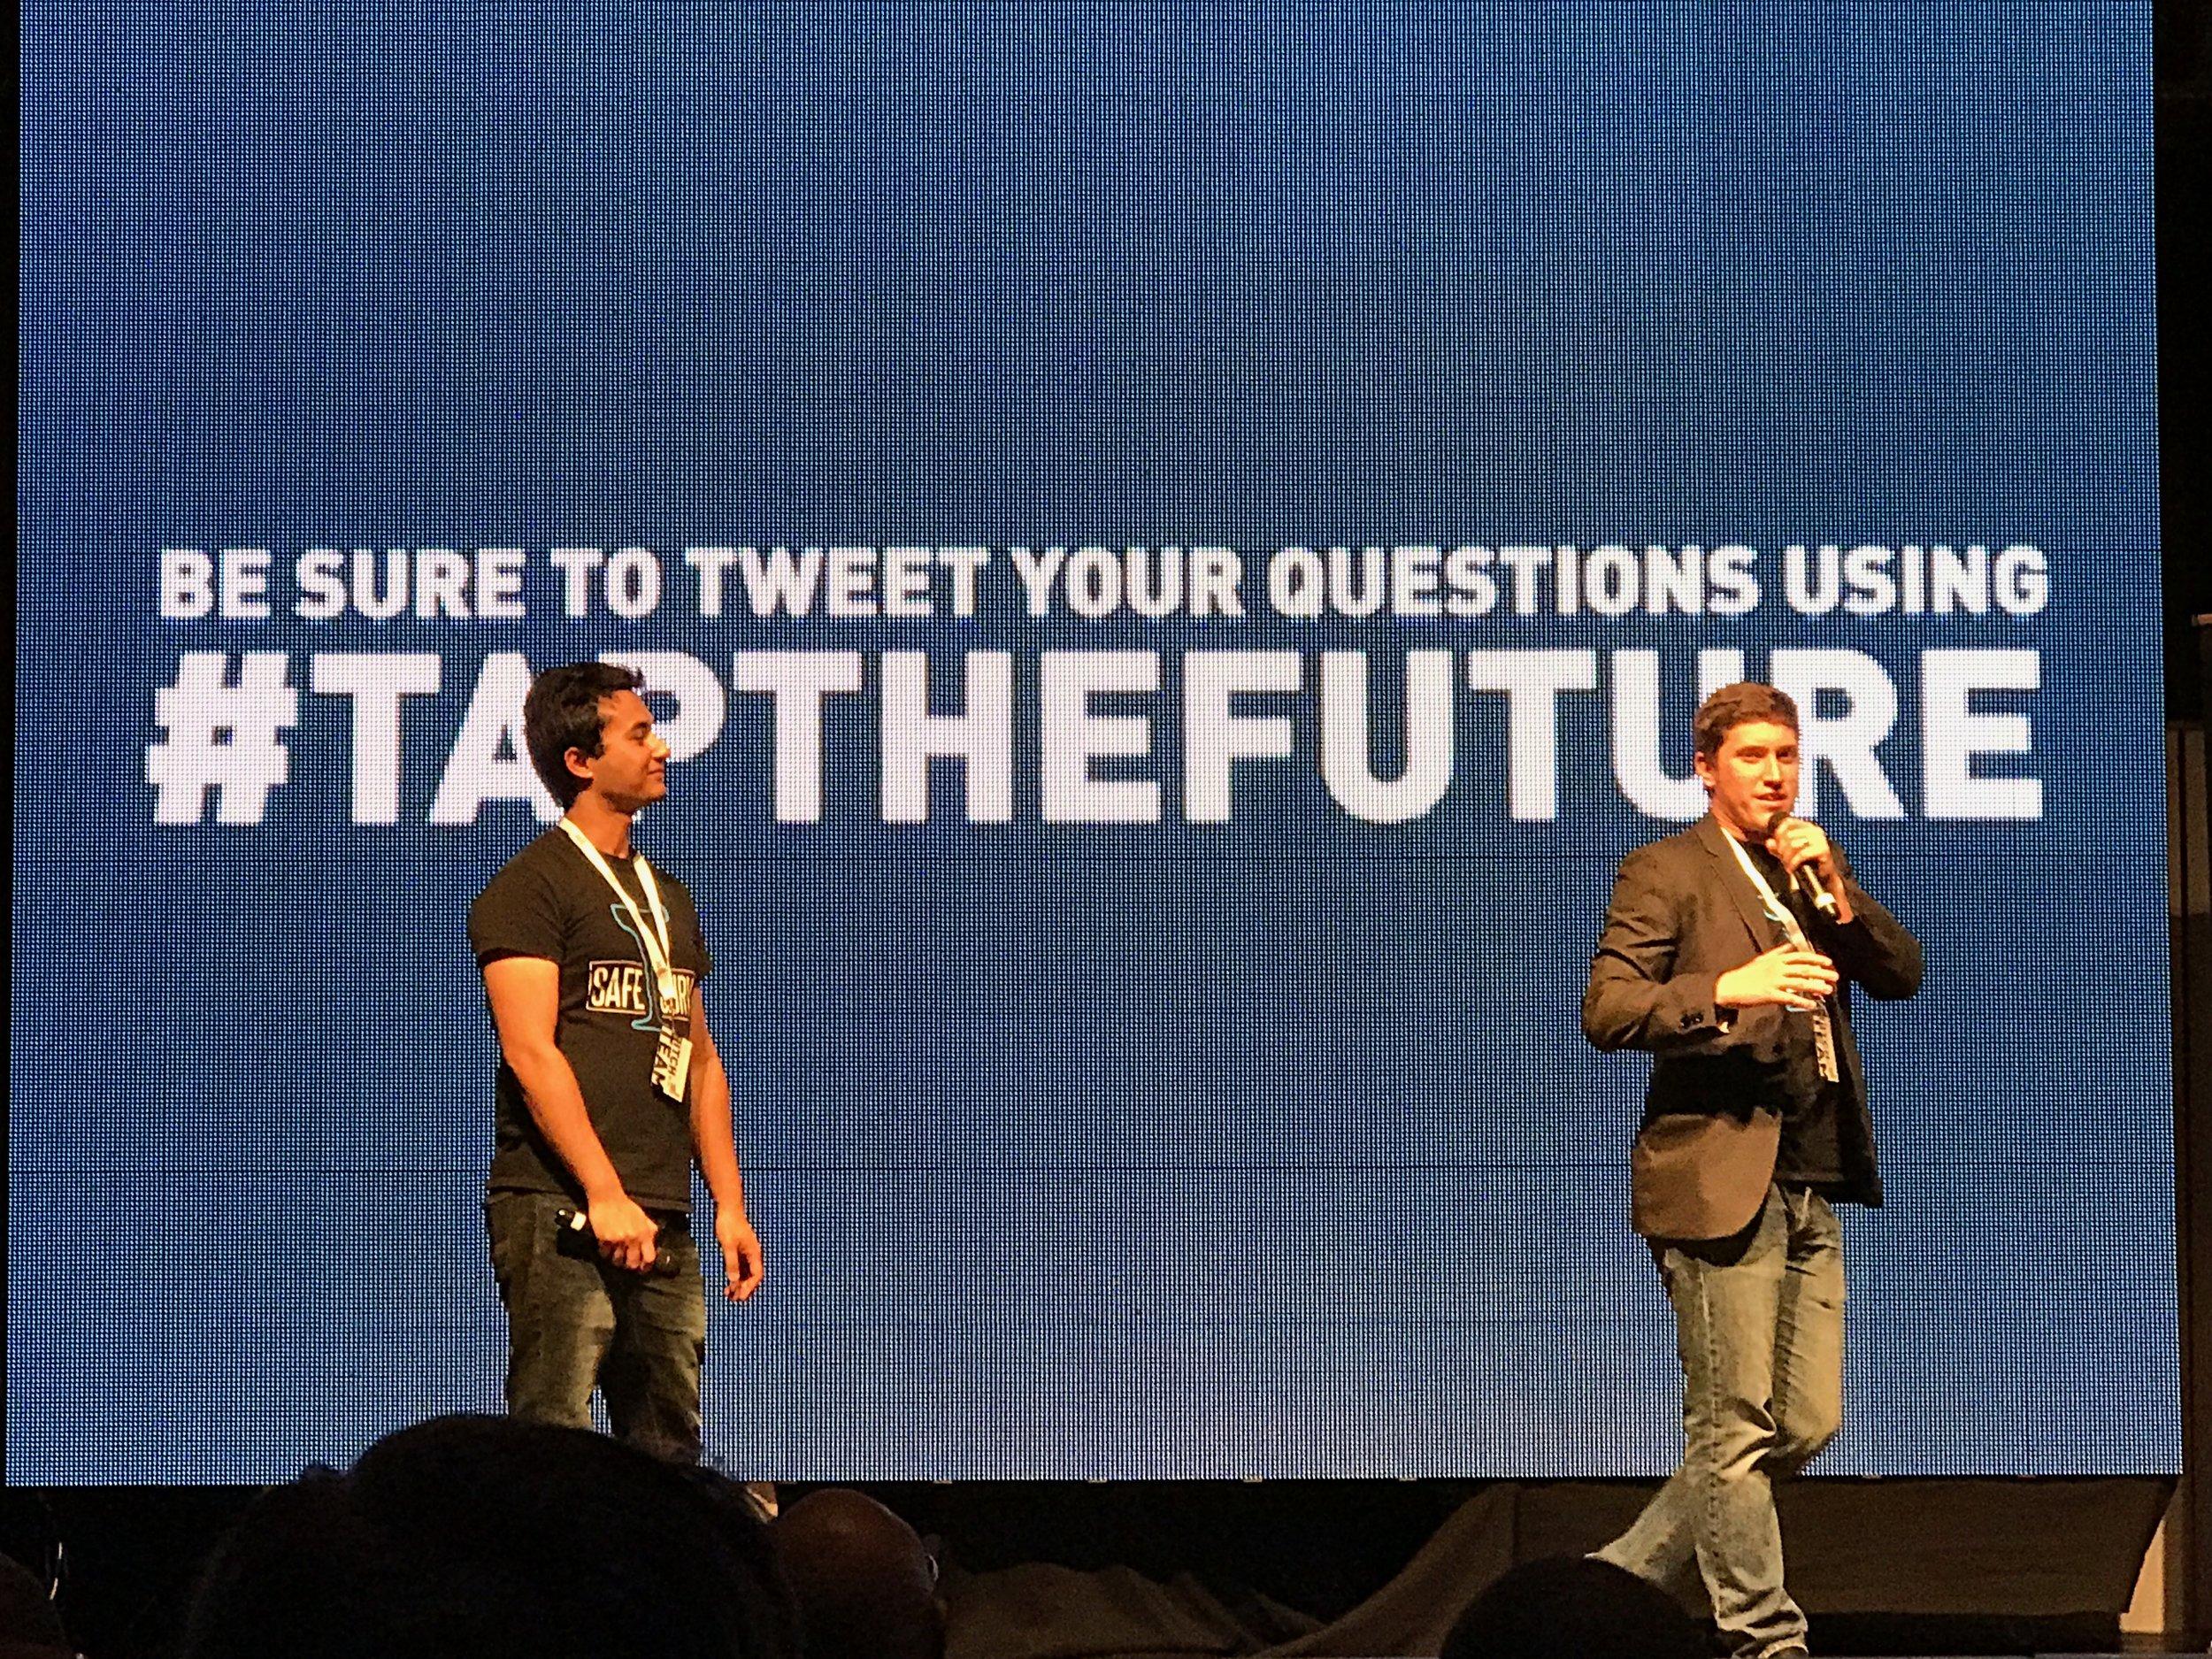 The SafeSurv Co-Founders - Shritesh Bhattarai (Left) and Charlie Jordan (Right)